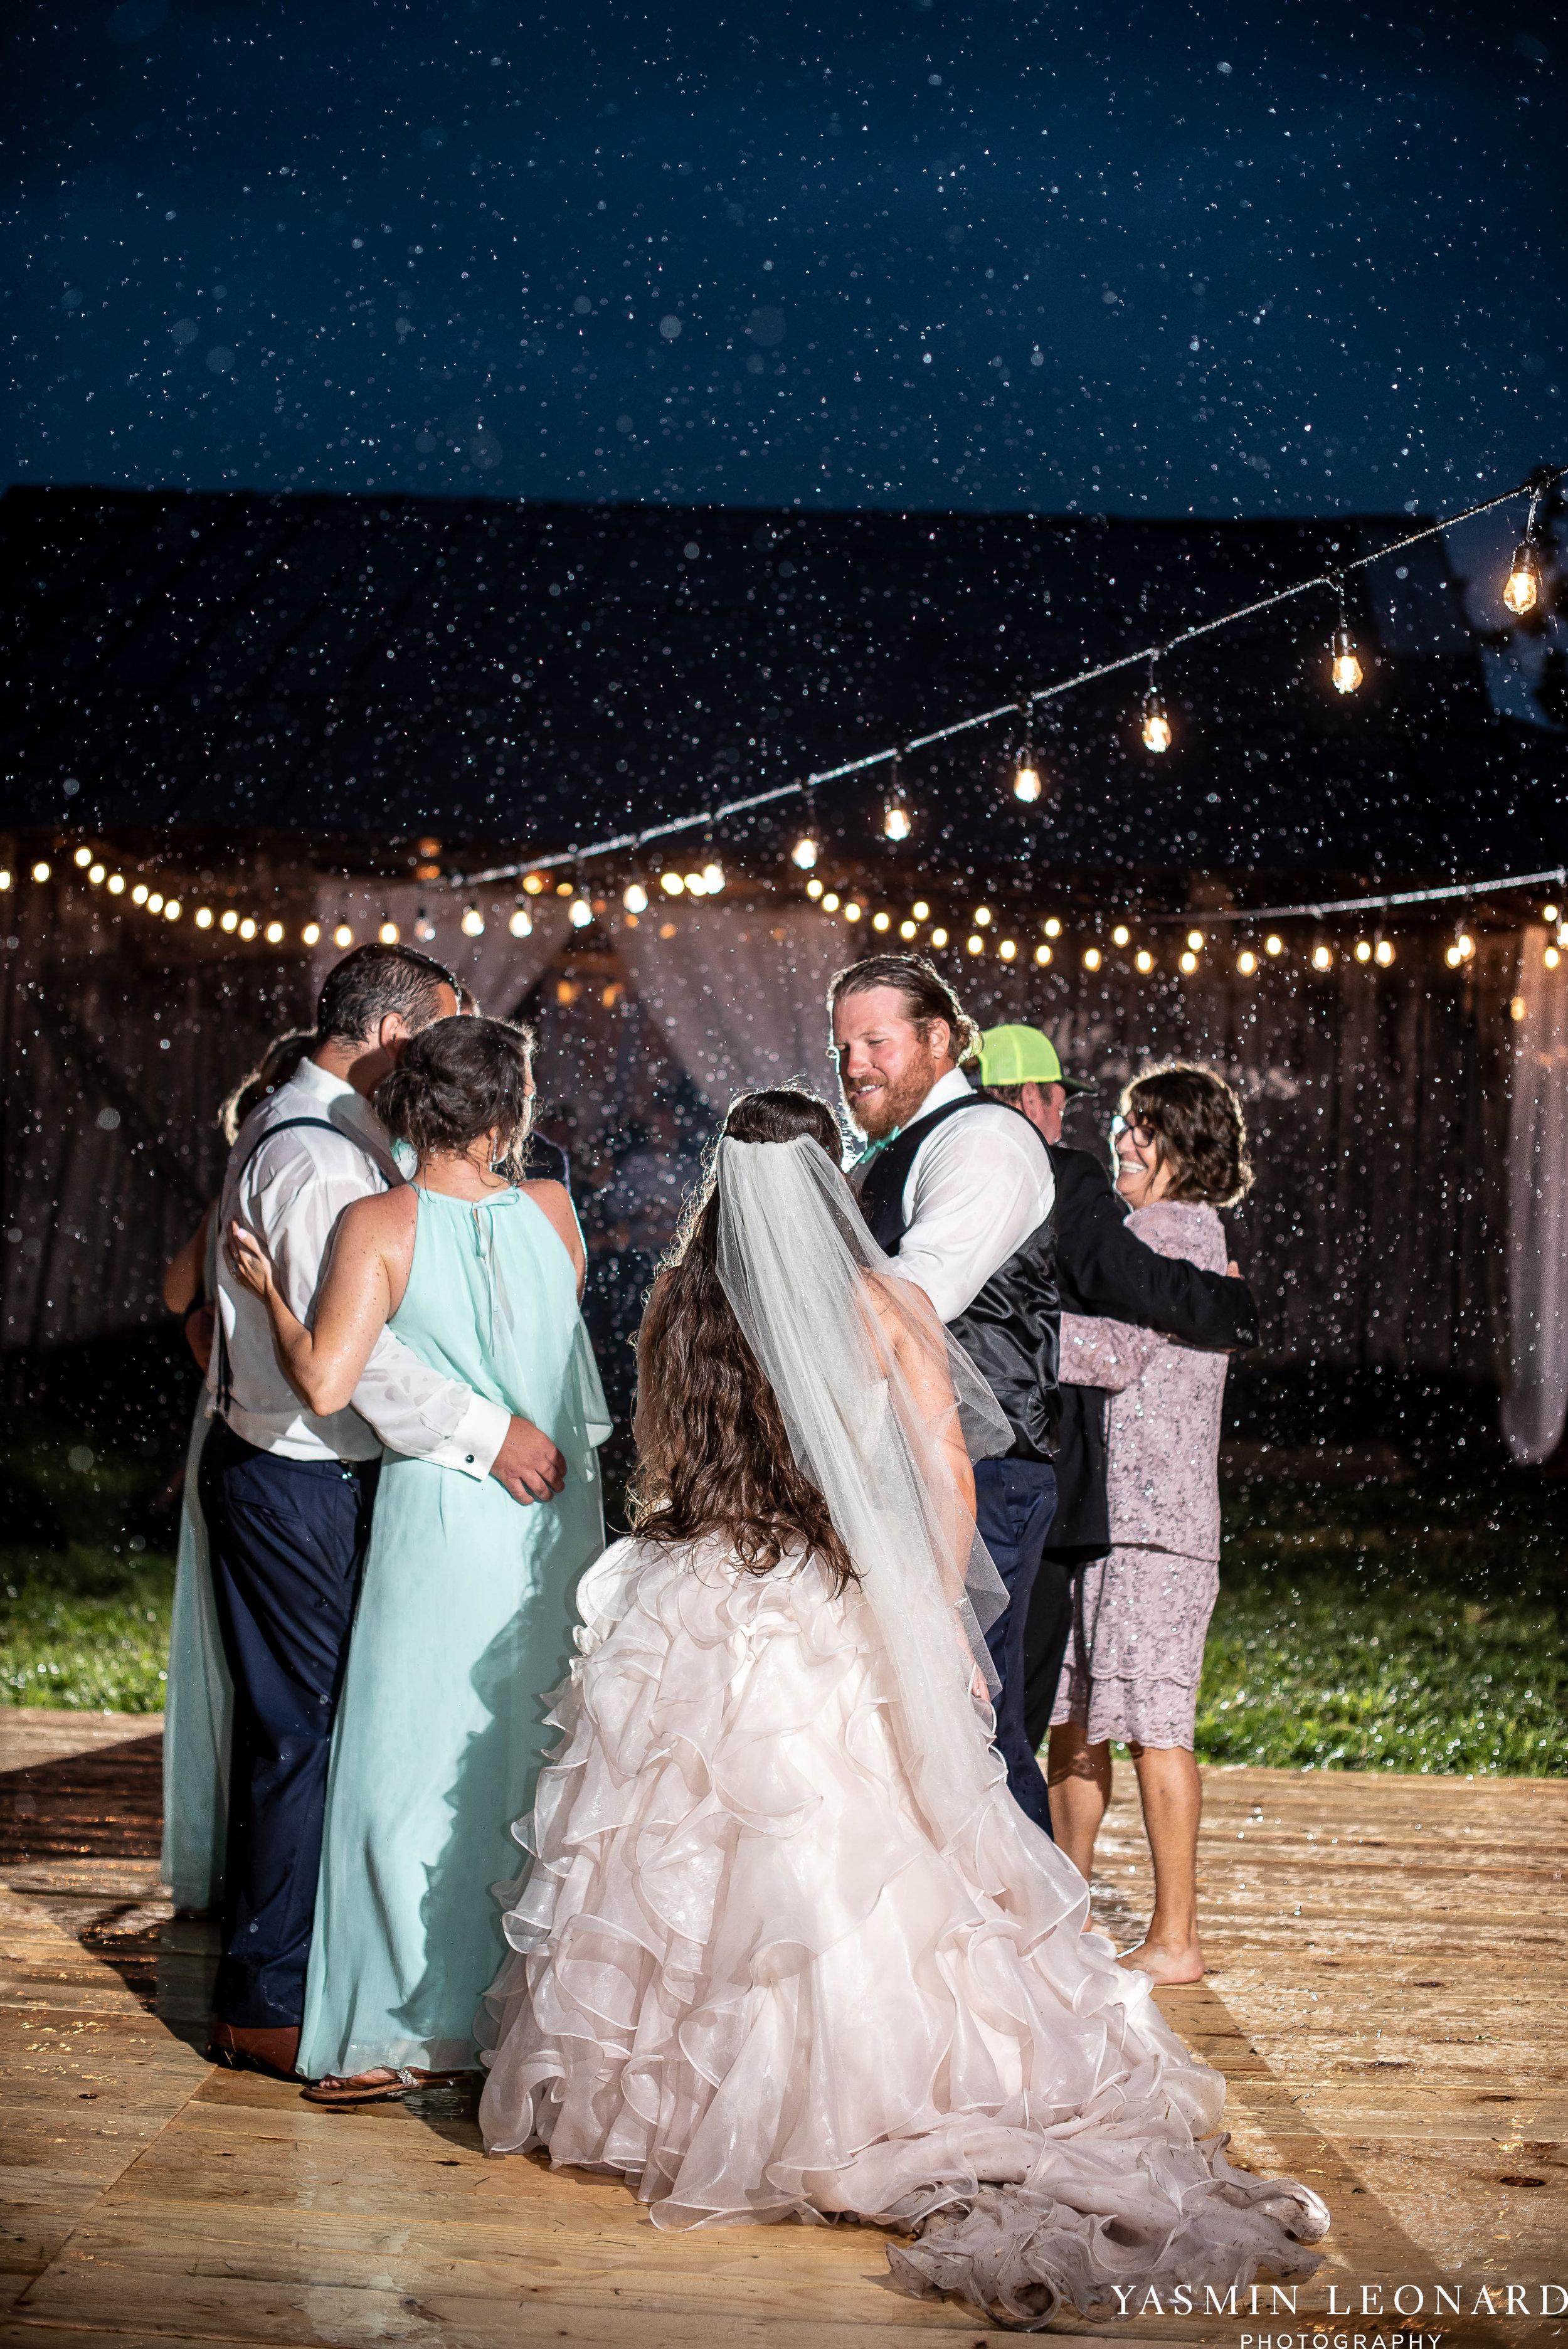 Rain on your wedding day - Rainy Wedding - Plan B for Rain - What to do if it rains on your wedding day - Wedding Inspiration - Outdoor wedding ideas - Rainy Wedding Pictures - Yasmin Leonard Photography-80.jpg